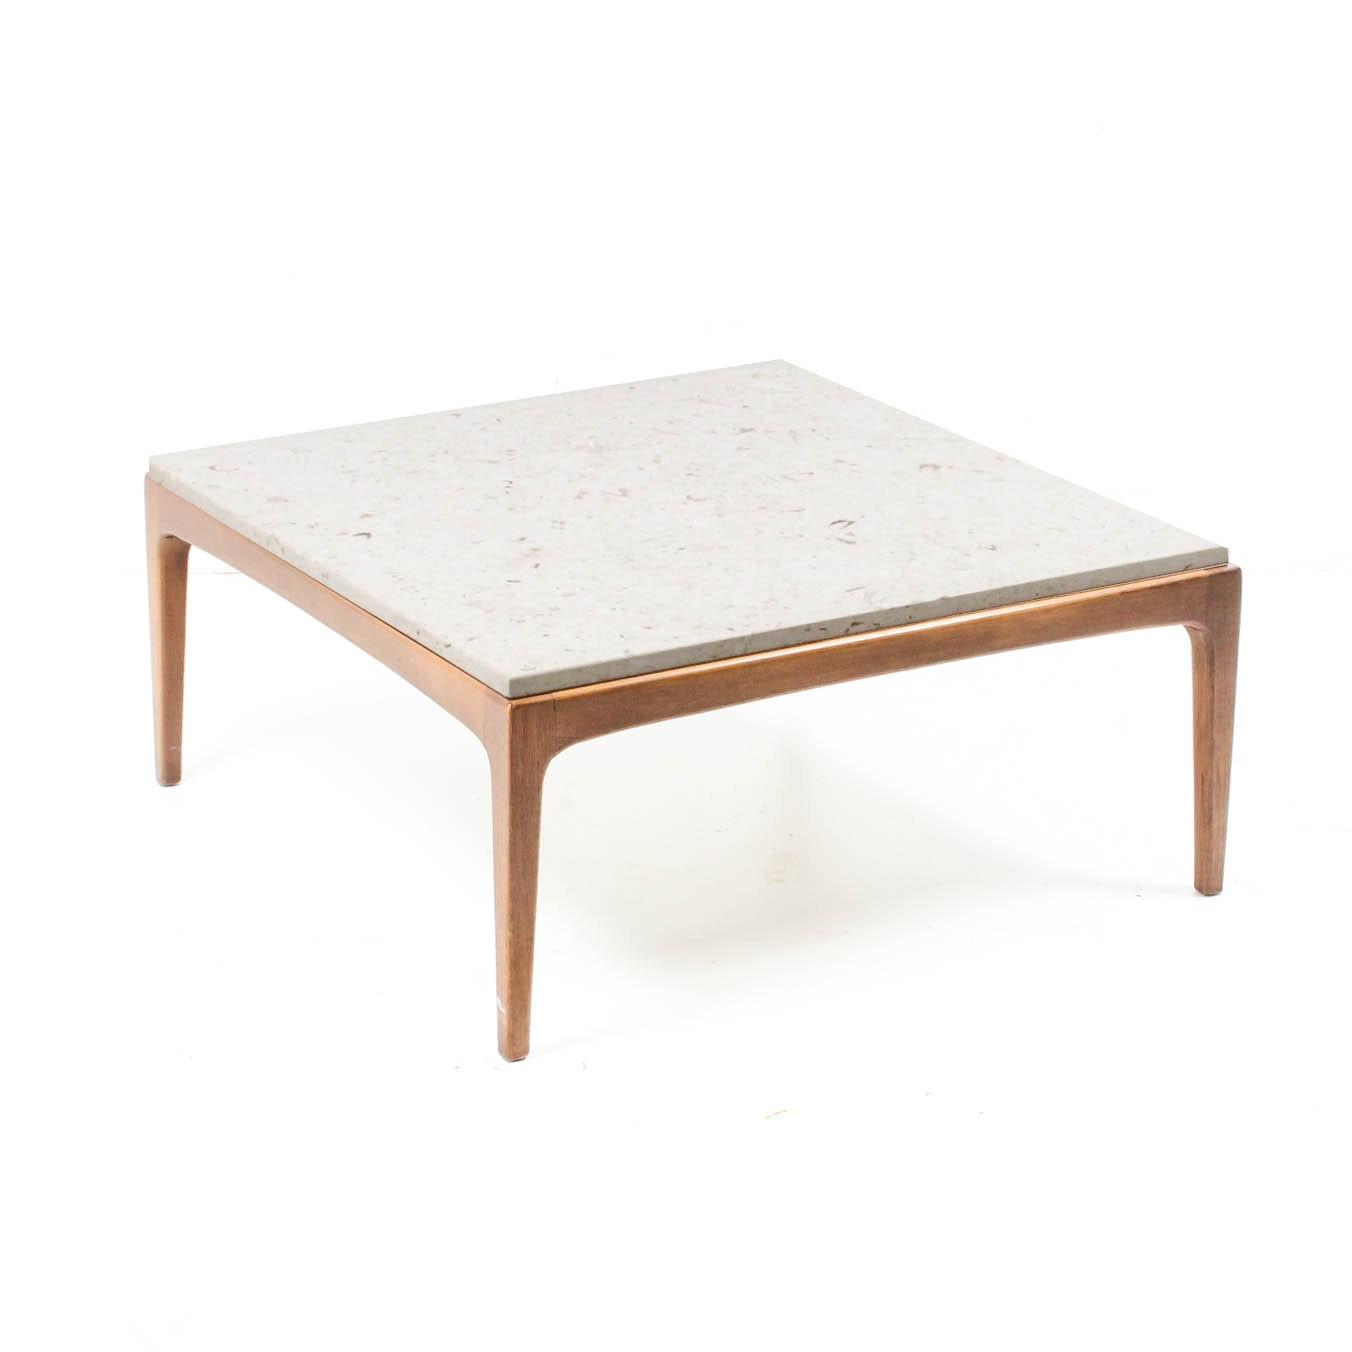 Danish Modern Marble Top Coffee Table